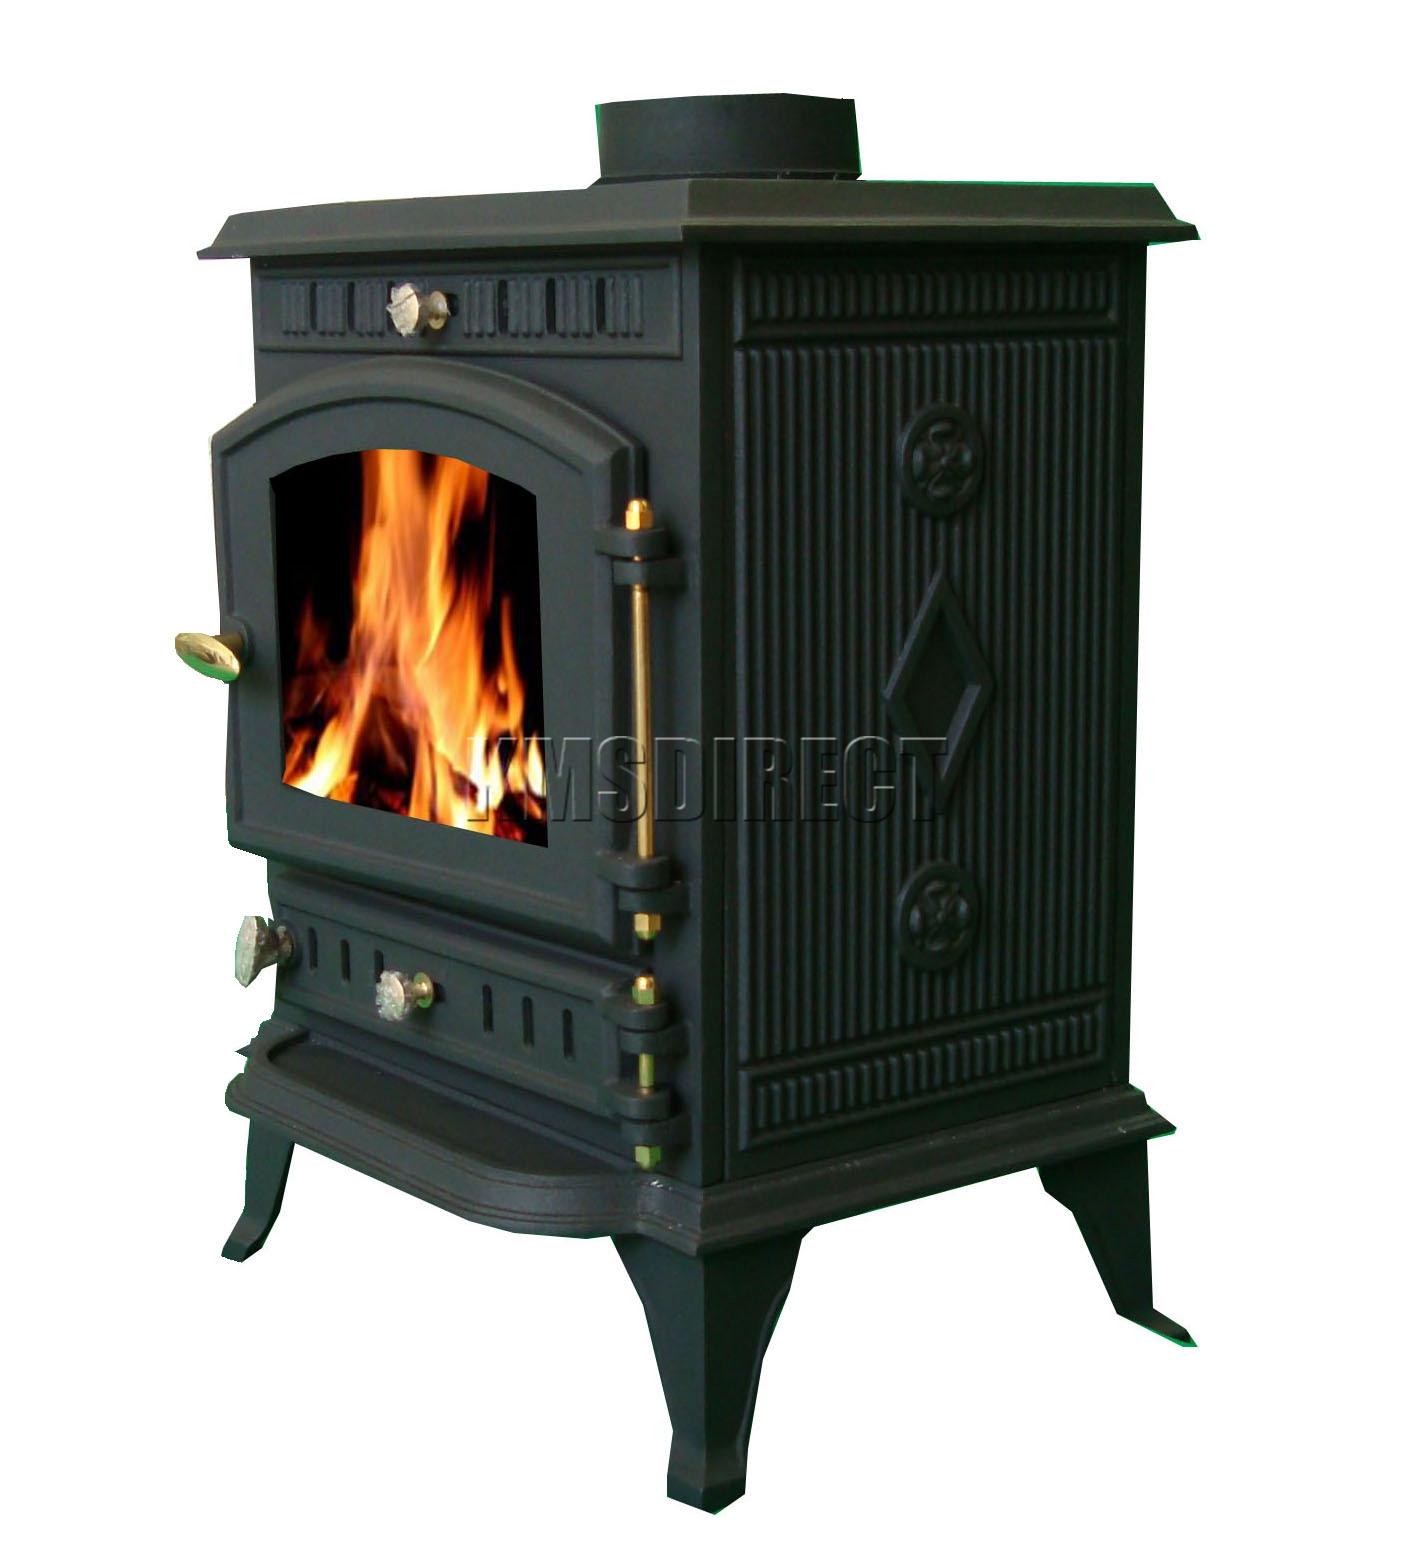 new cast iron log burner multifuel wood burning 7 kw stove. Black Bedroom Furniture Sets. Home Design Ideas